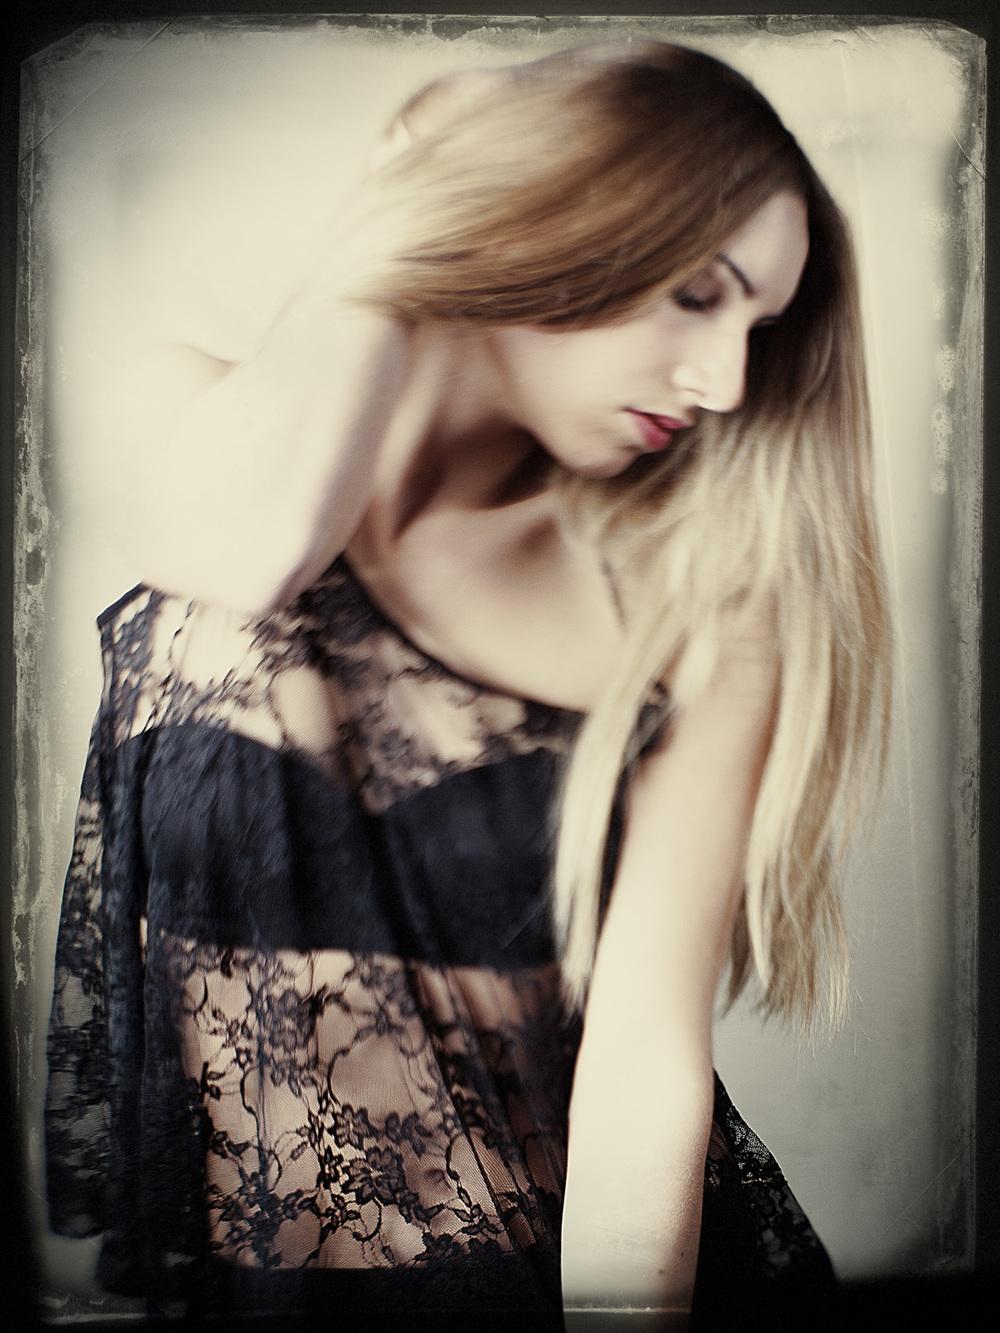 Bernard_Panier-FashionLike-017.jpg